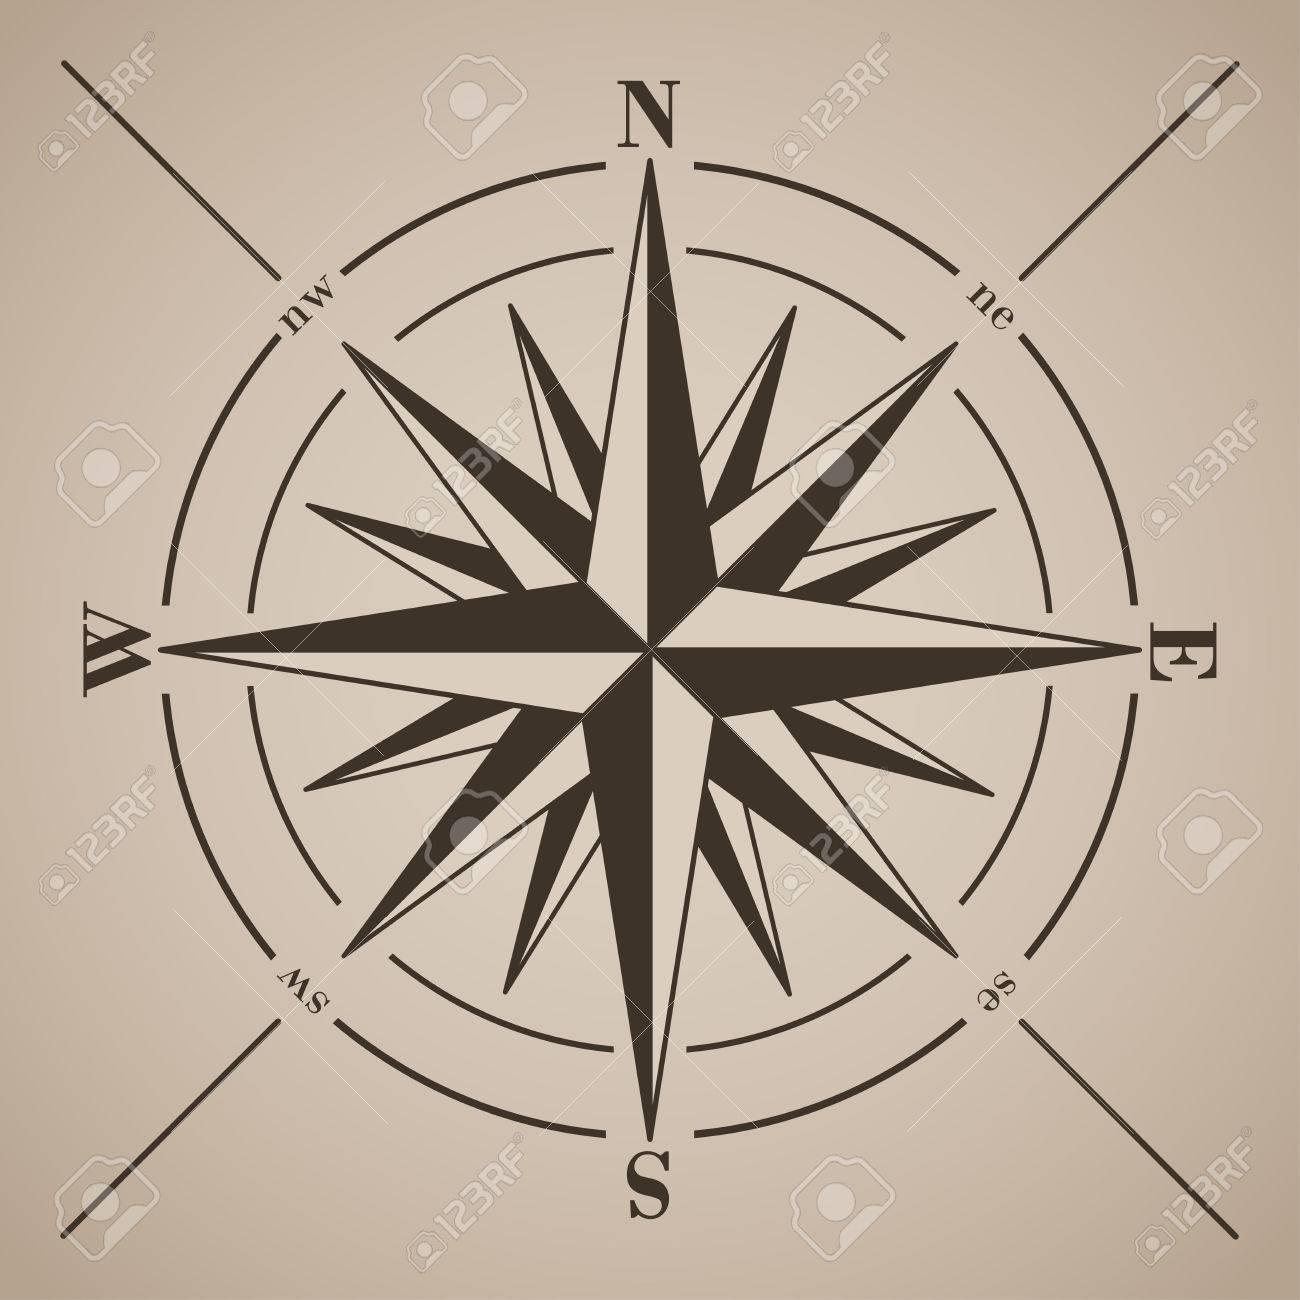 Compass rose. Vector illustration. - 31526943